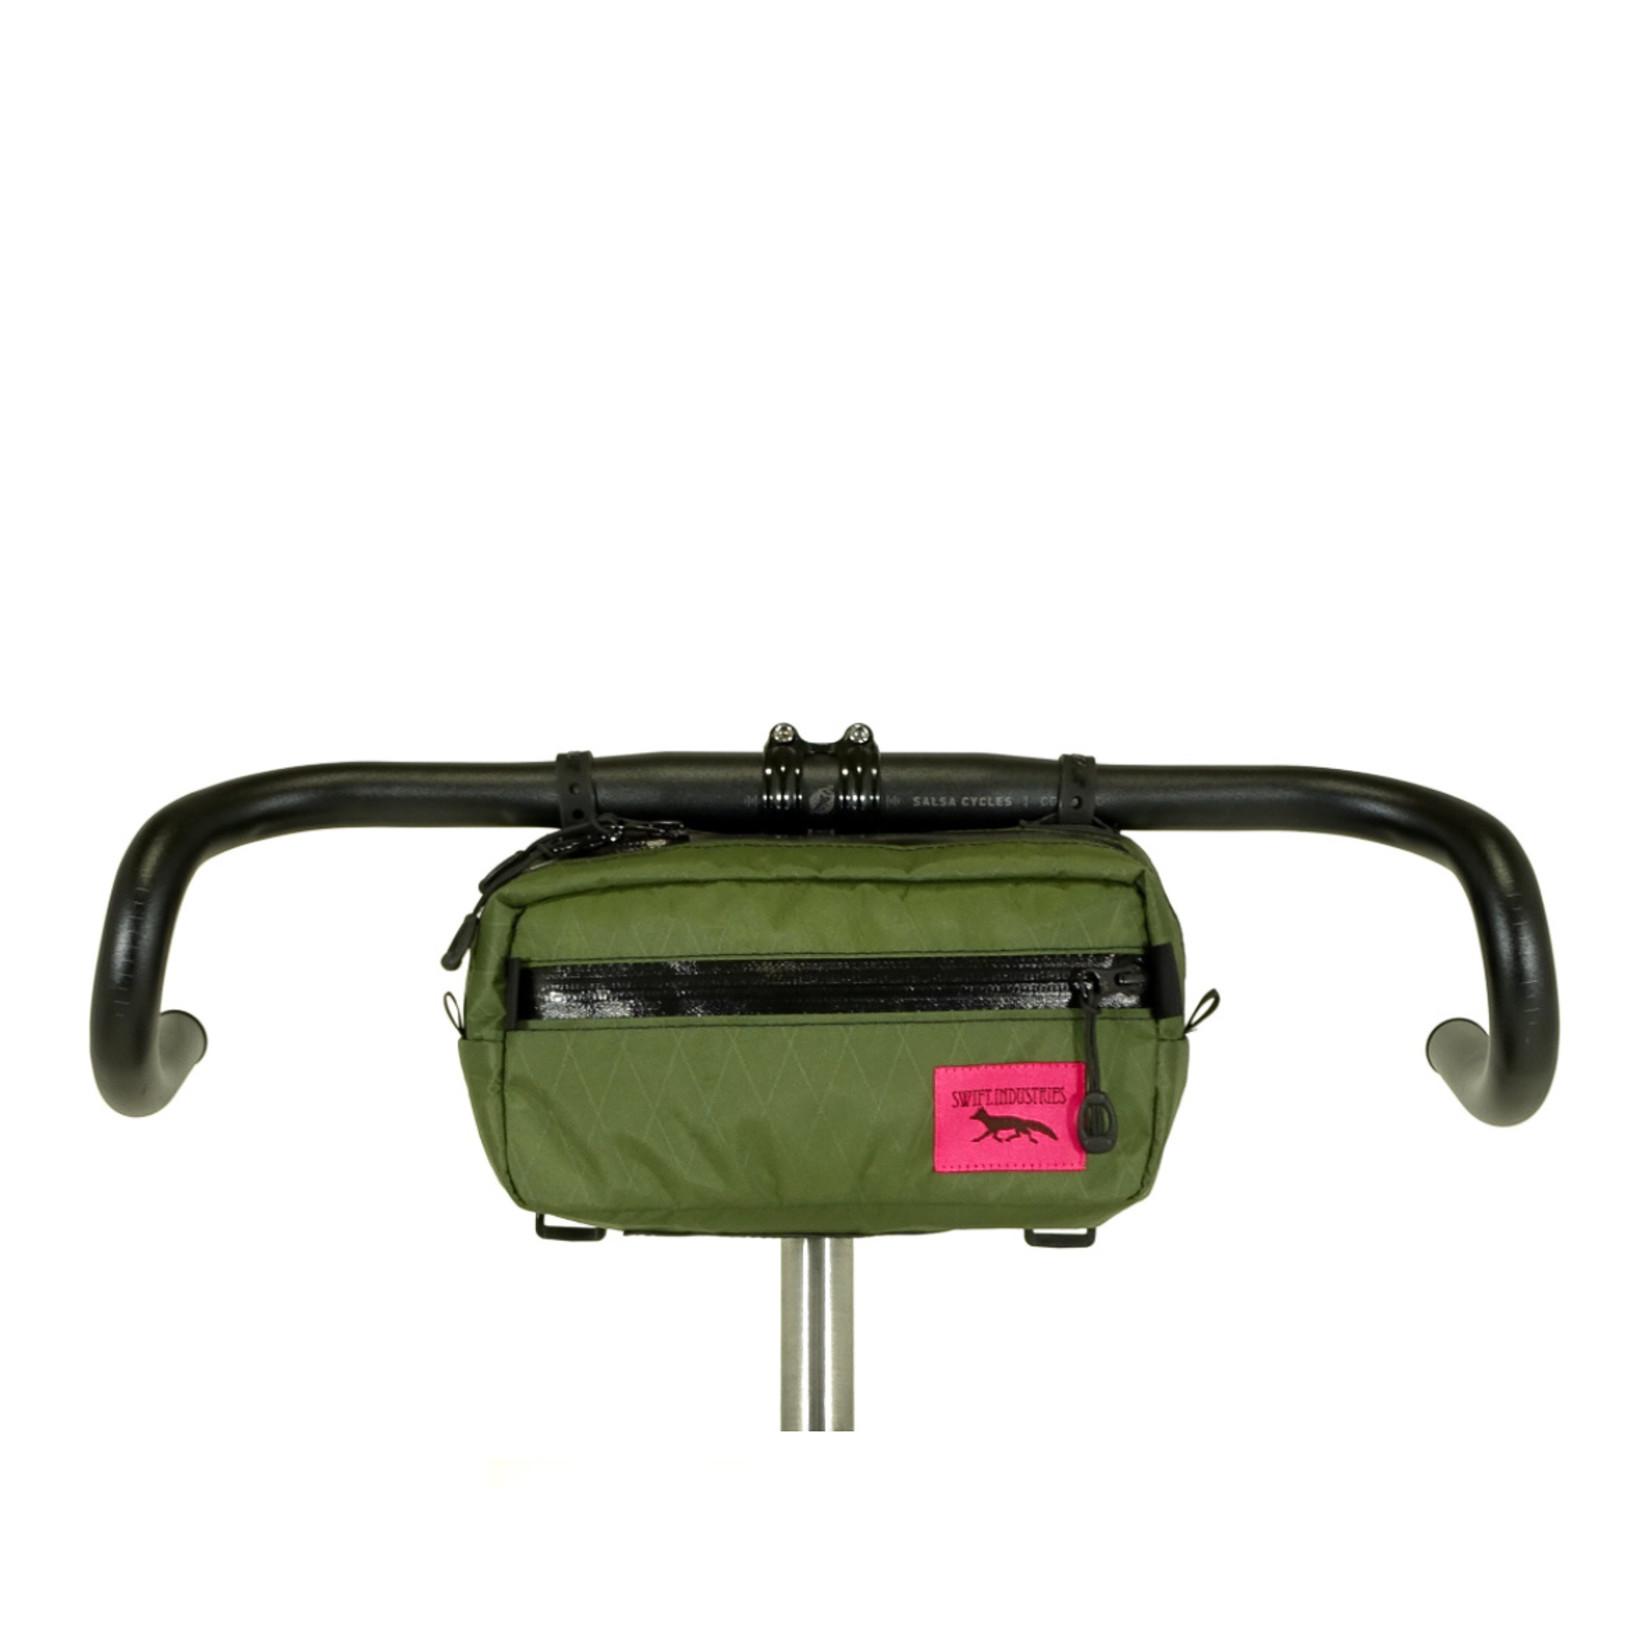 Swift Industries Swift Industries Kestrel Handlebar Bag